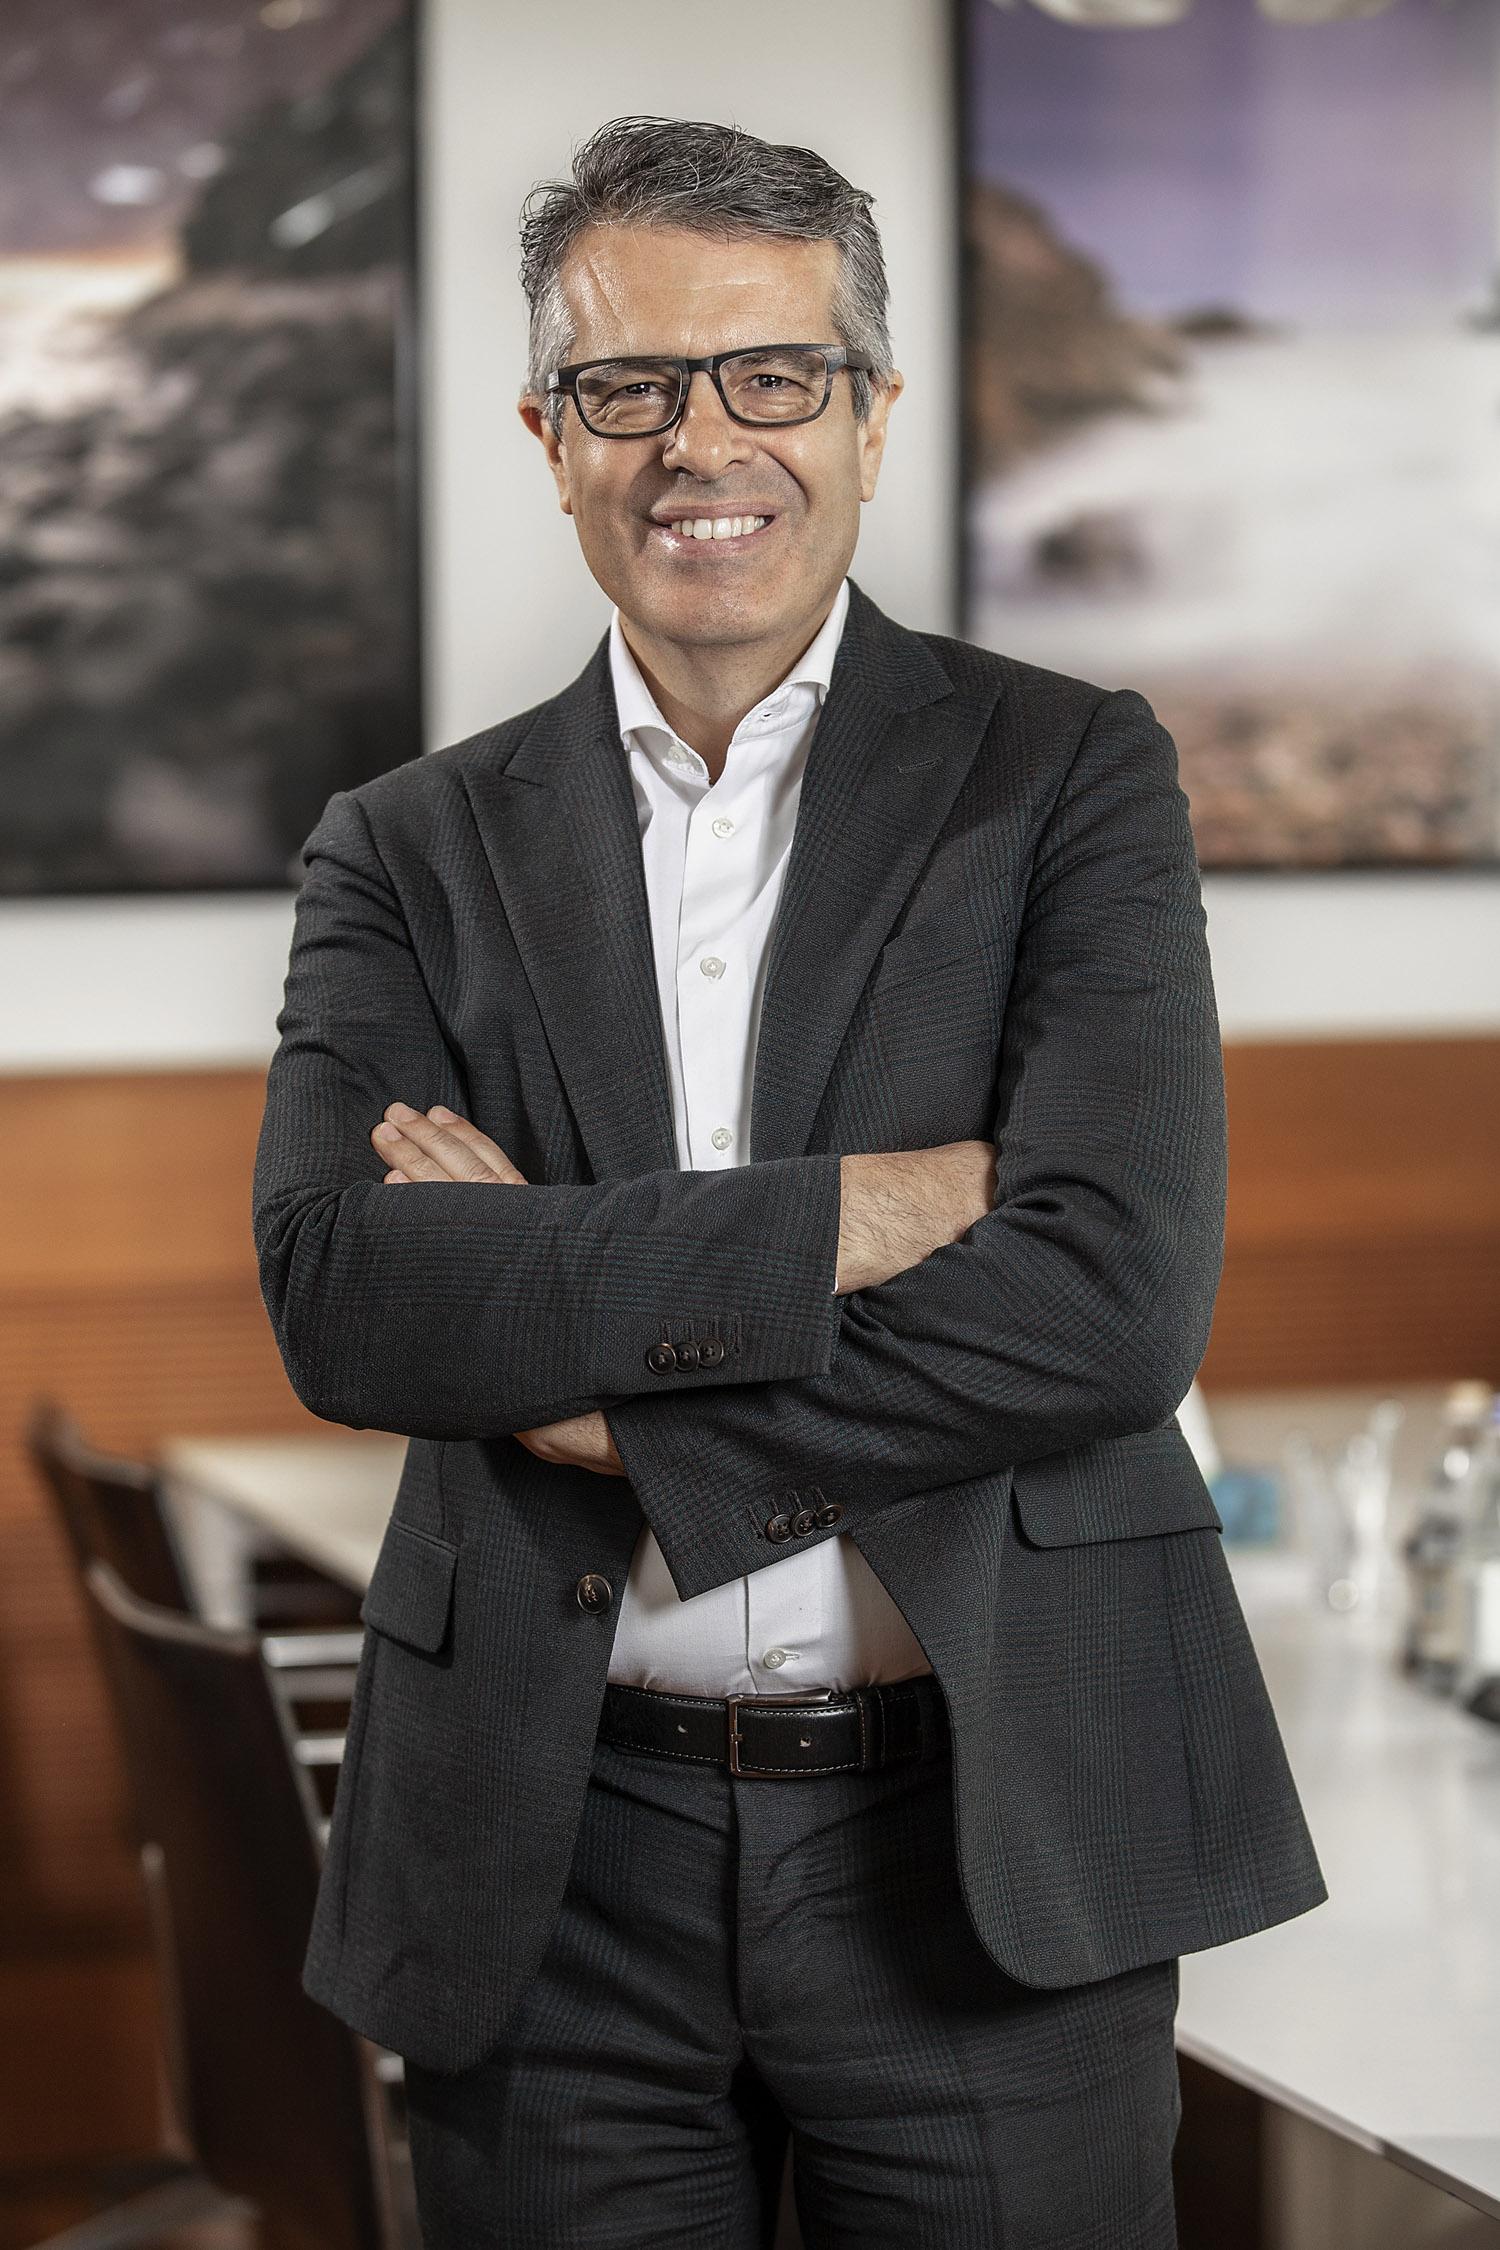 Wise Equity - Michele Semenzato - Partner Fondatore